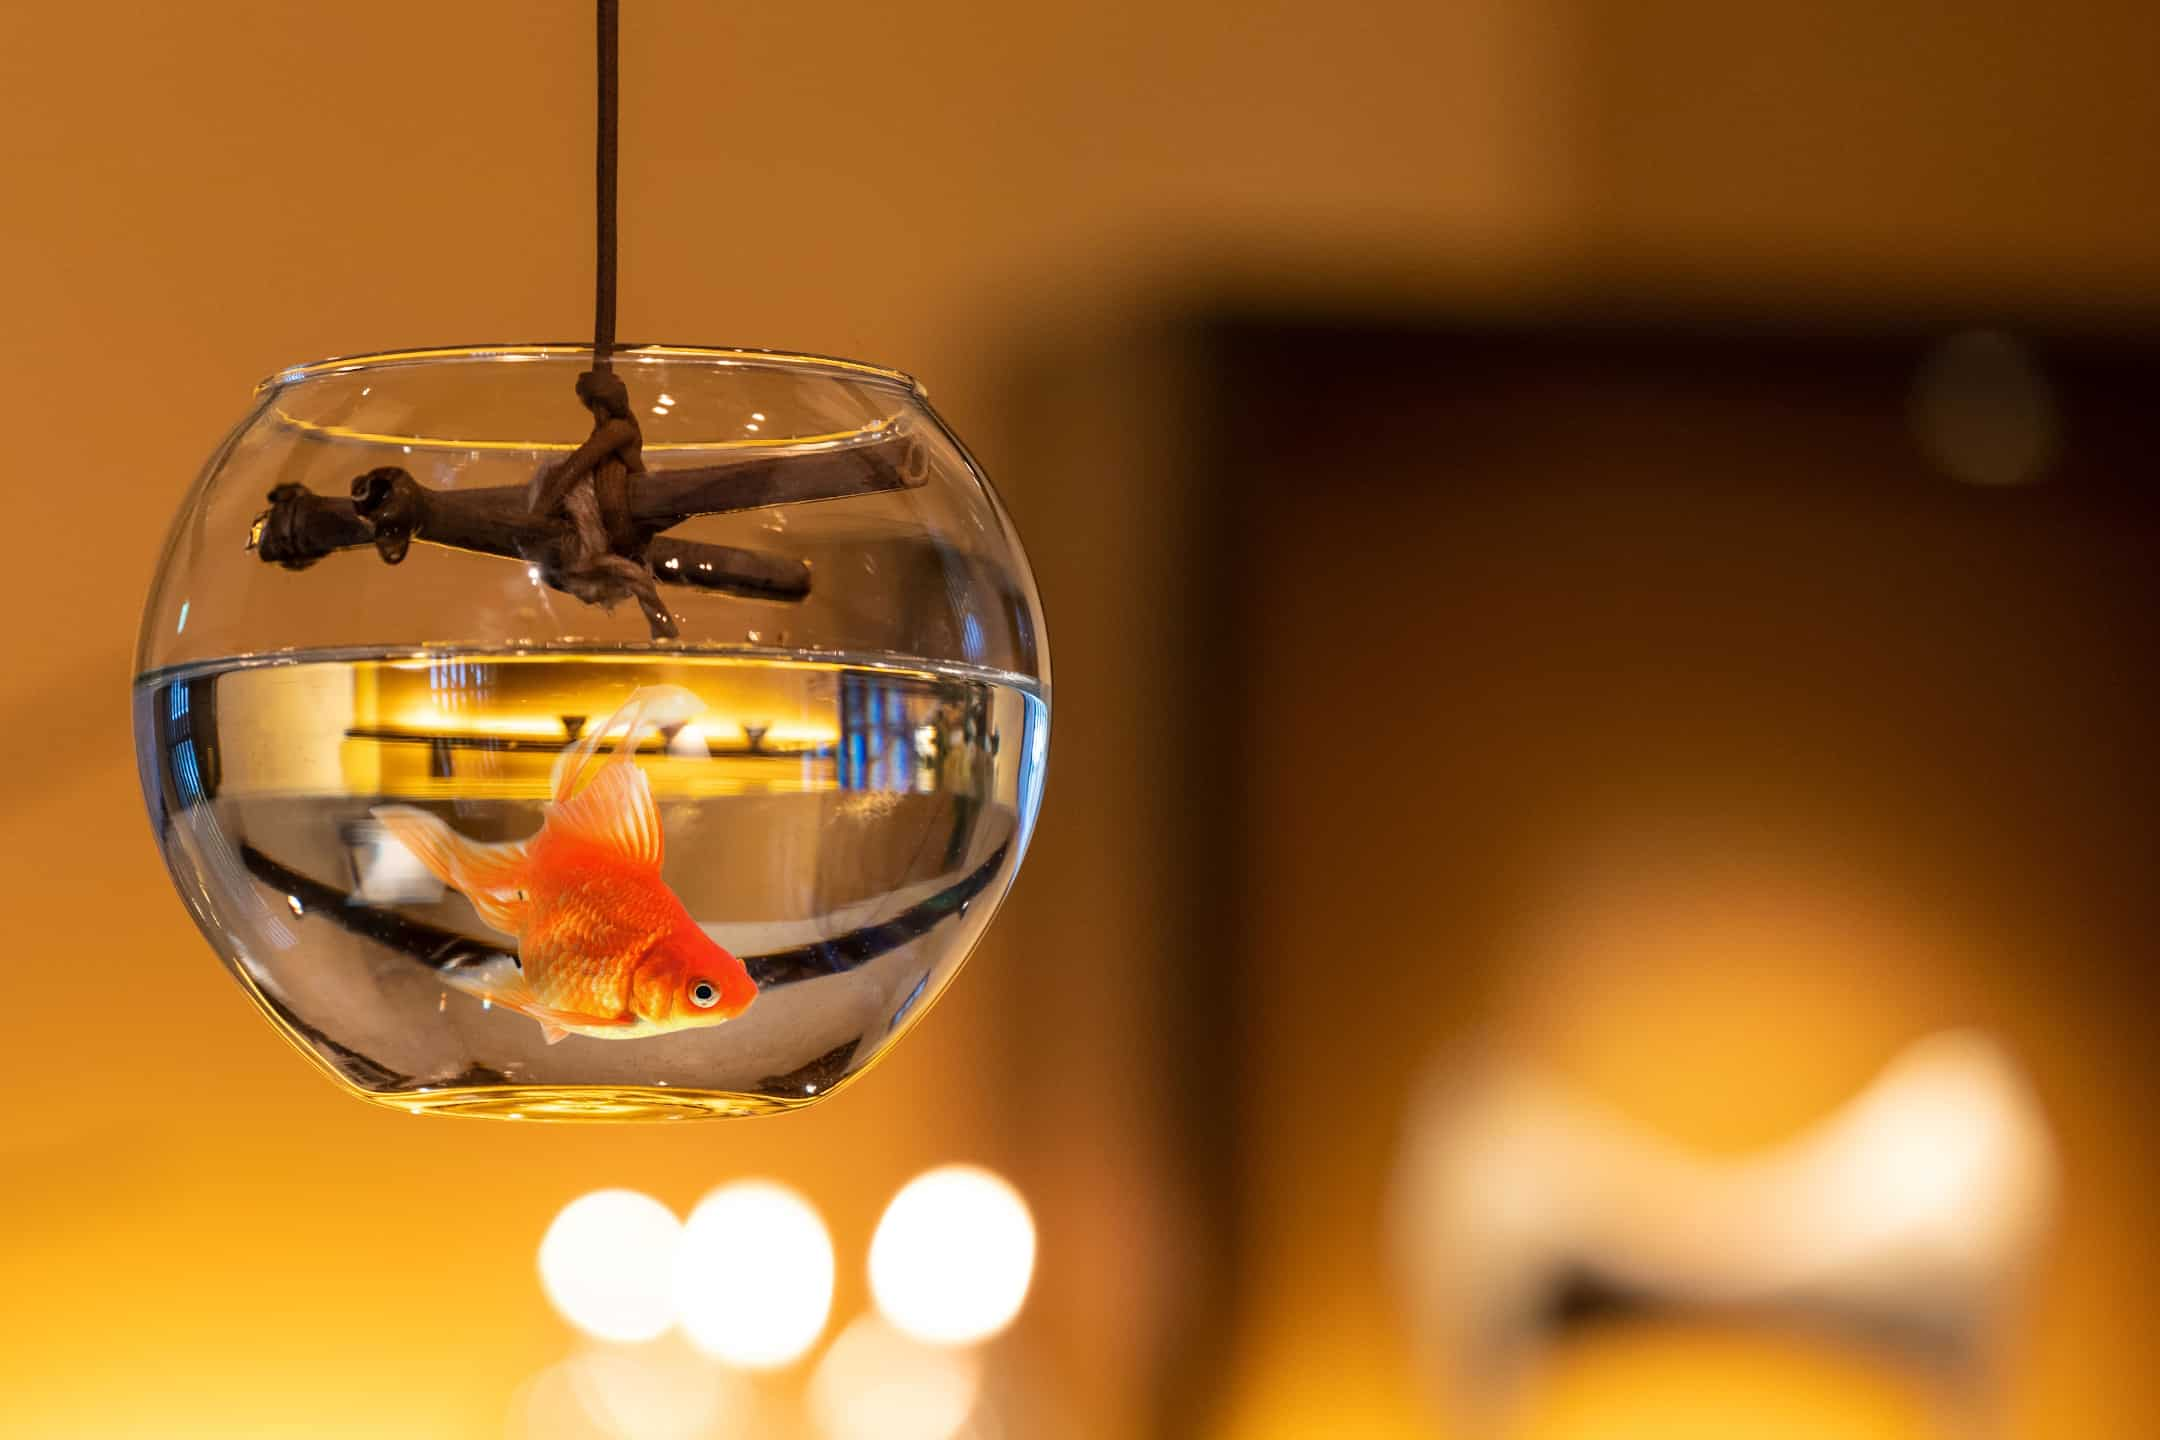 %e6%98%9f%e3%81%ae%e3%82%84-%e9%87%91%e9%ad%9abar-hoshinoya-goldfish-bar-%e6%98%9f%e9%87%8e%e9%9b%86%e5%9b%a2_5-2